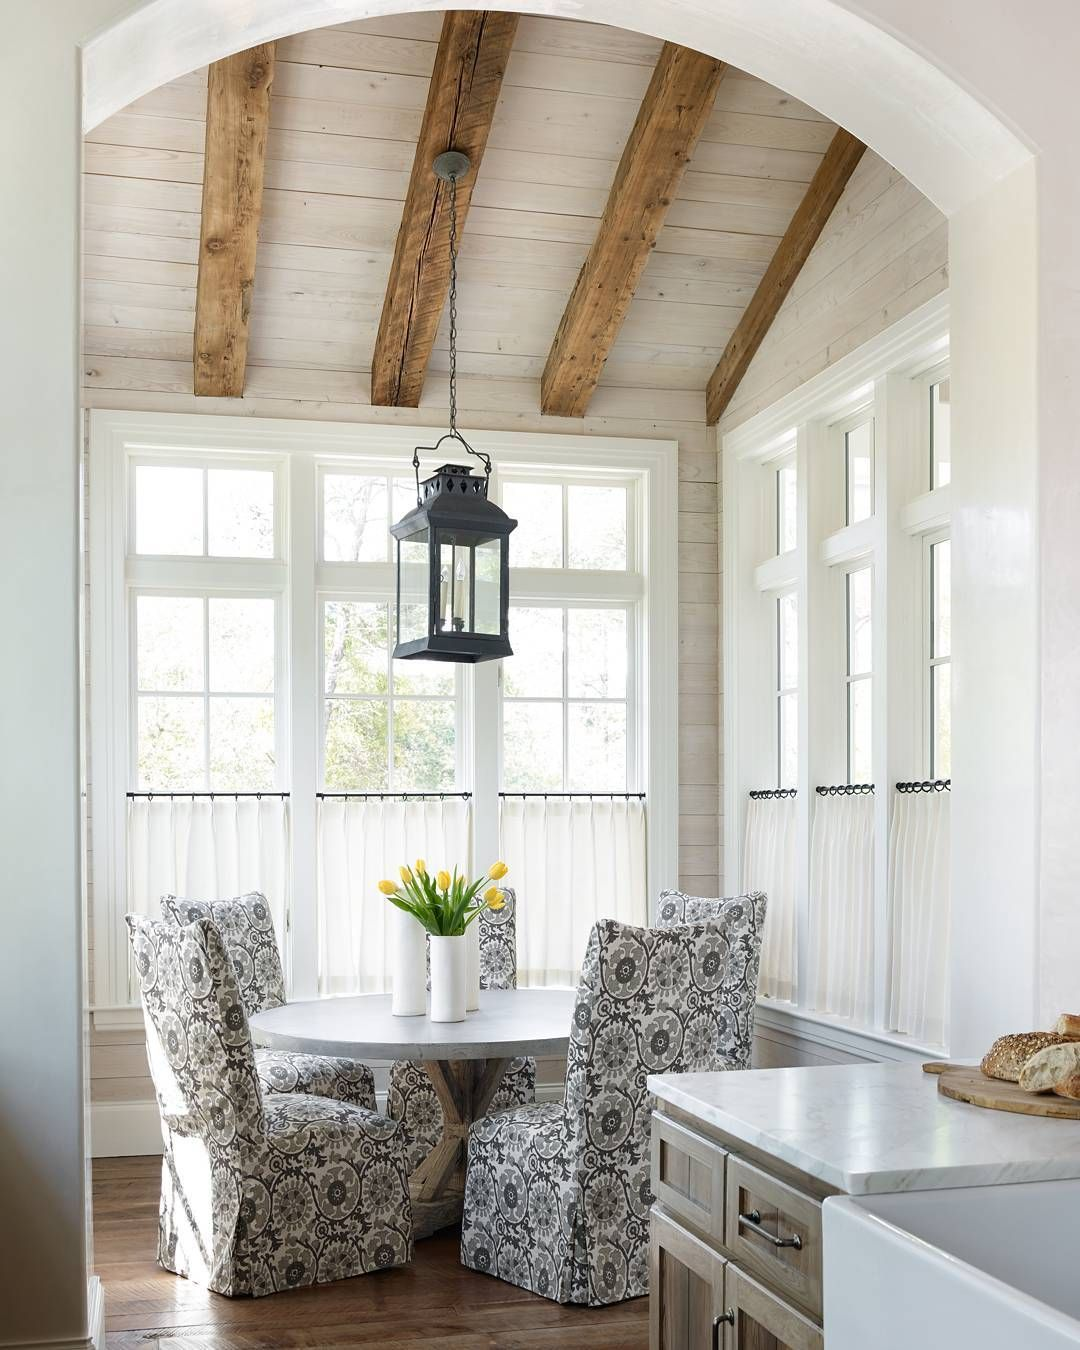 Sunroom Dining Room: I Like This Lighting Idea For A Breakfast Nook